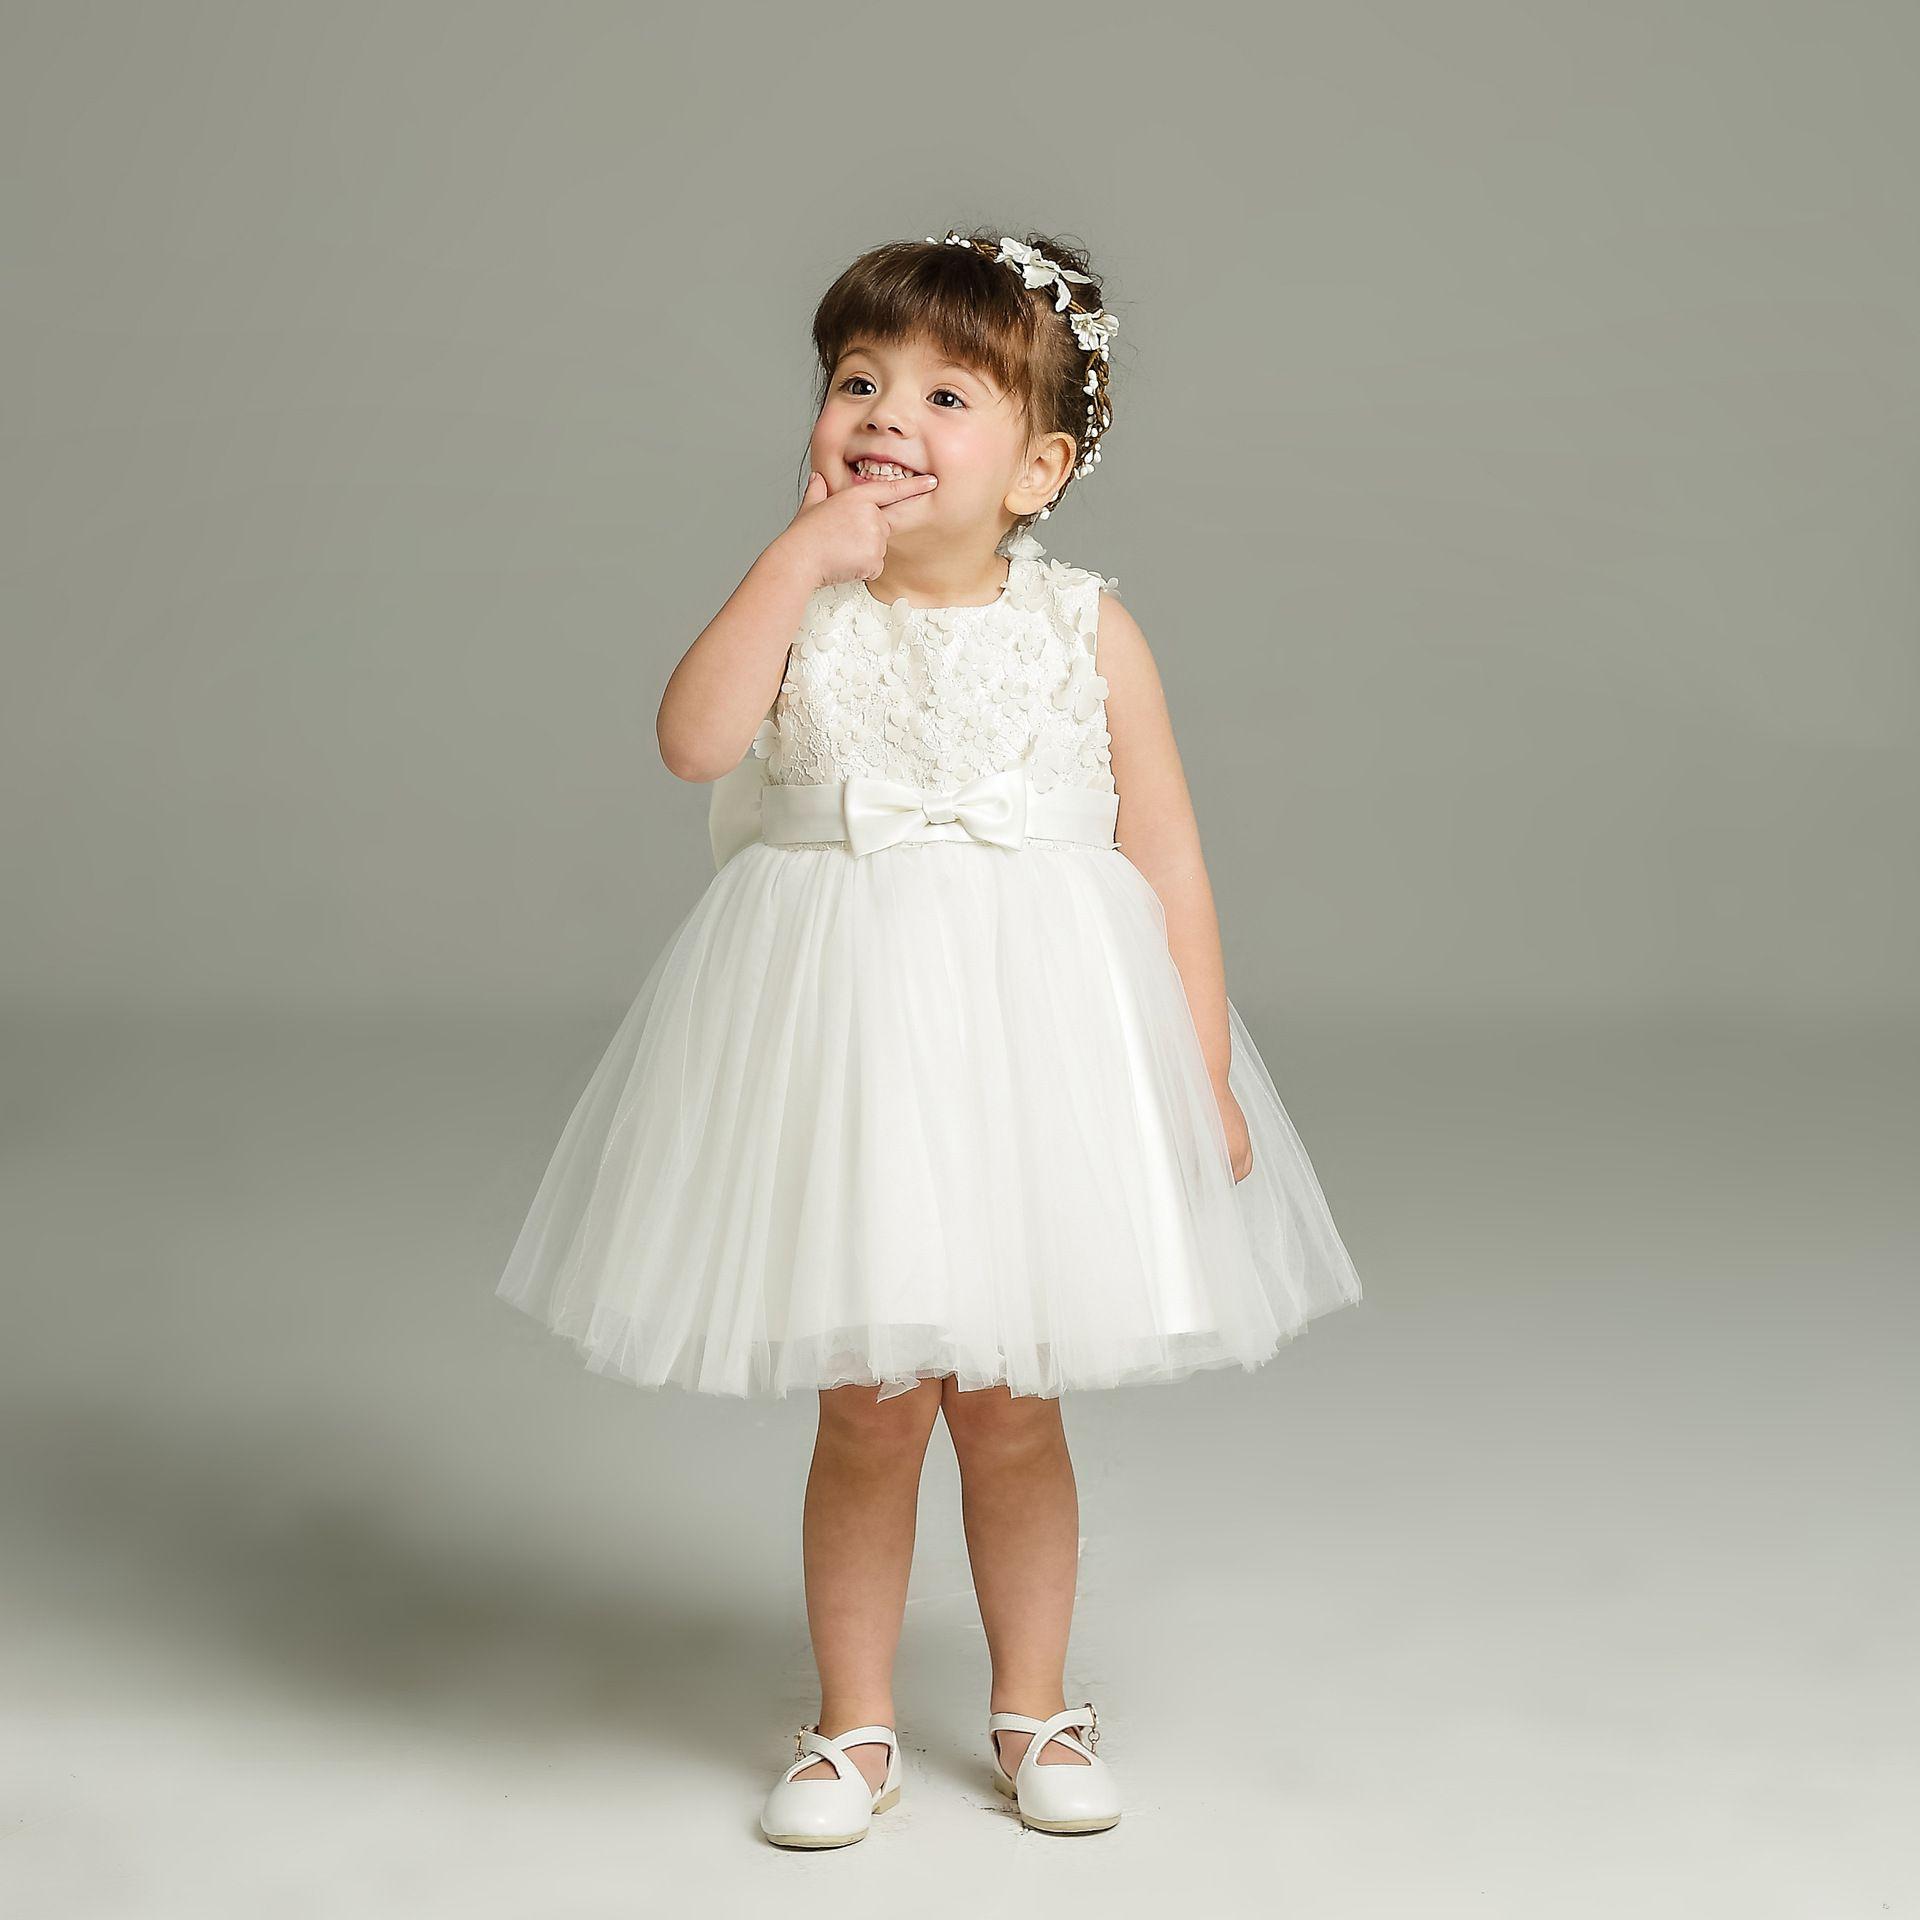 2018 Sale White Baby Flower Girl Dress For Wedding Boutique Girl ...